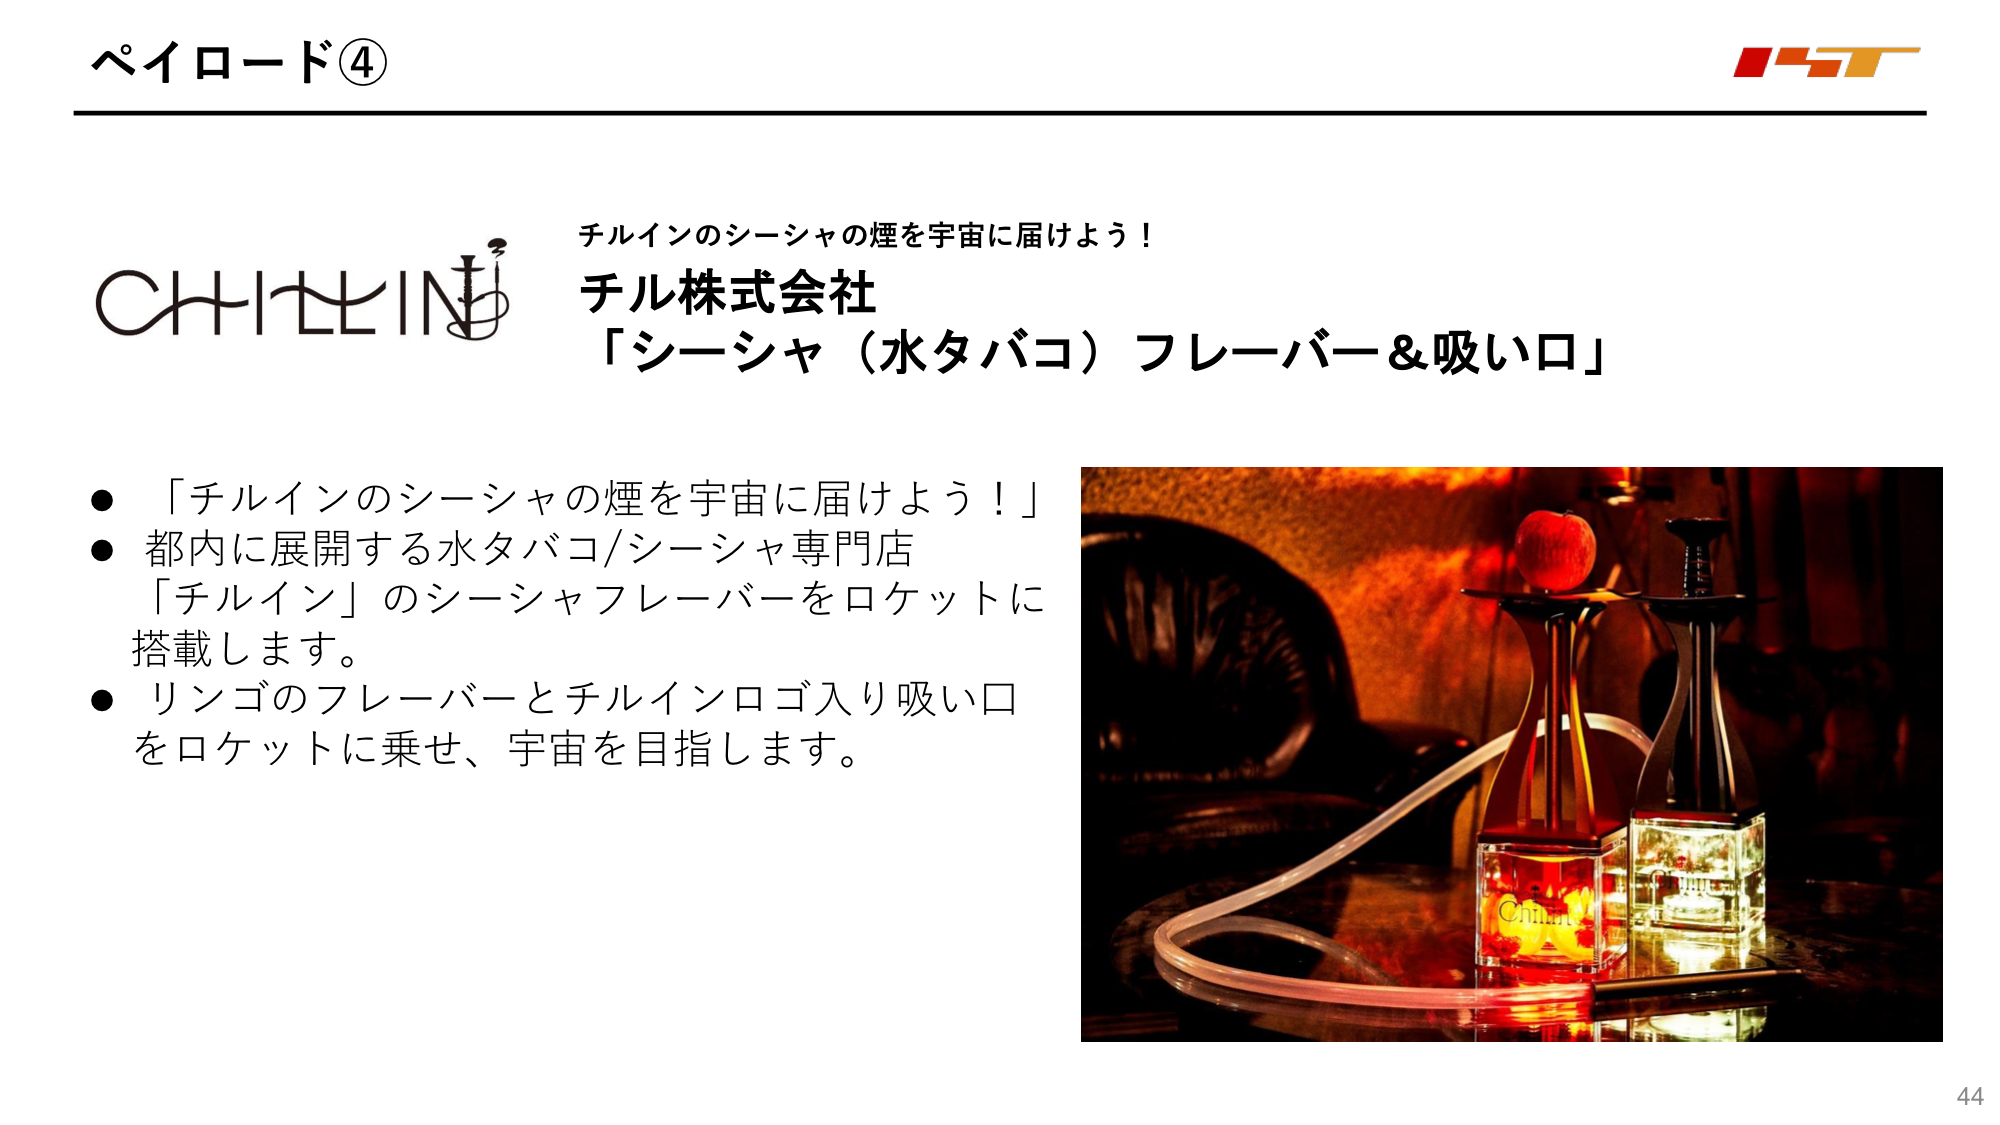 f:id:Imamura:20200603233156p:plain